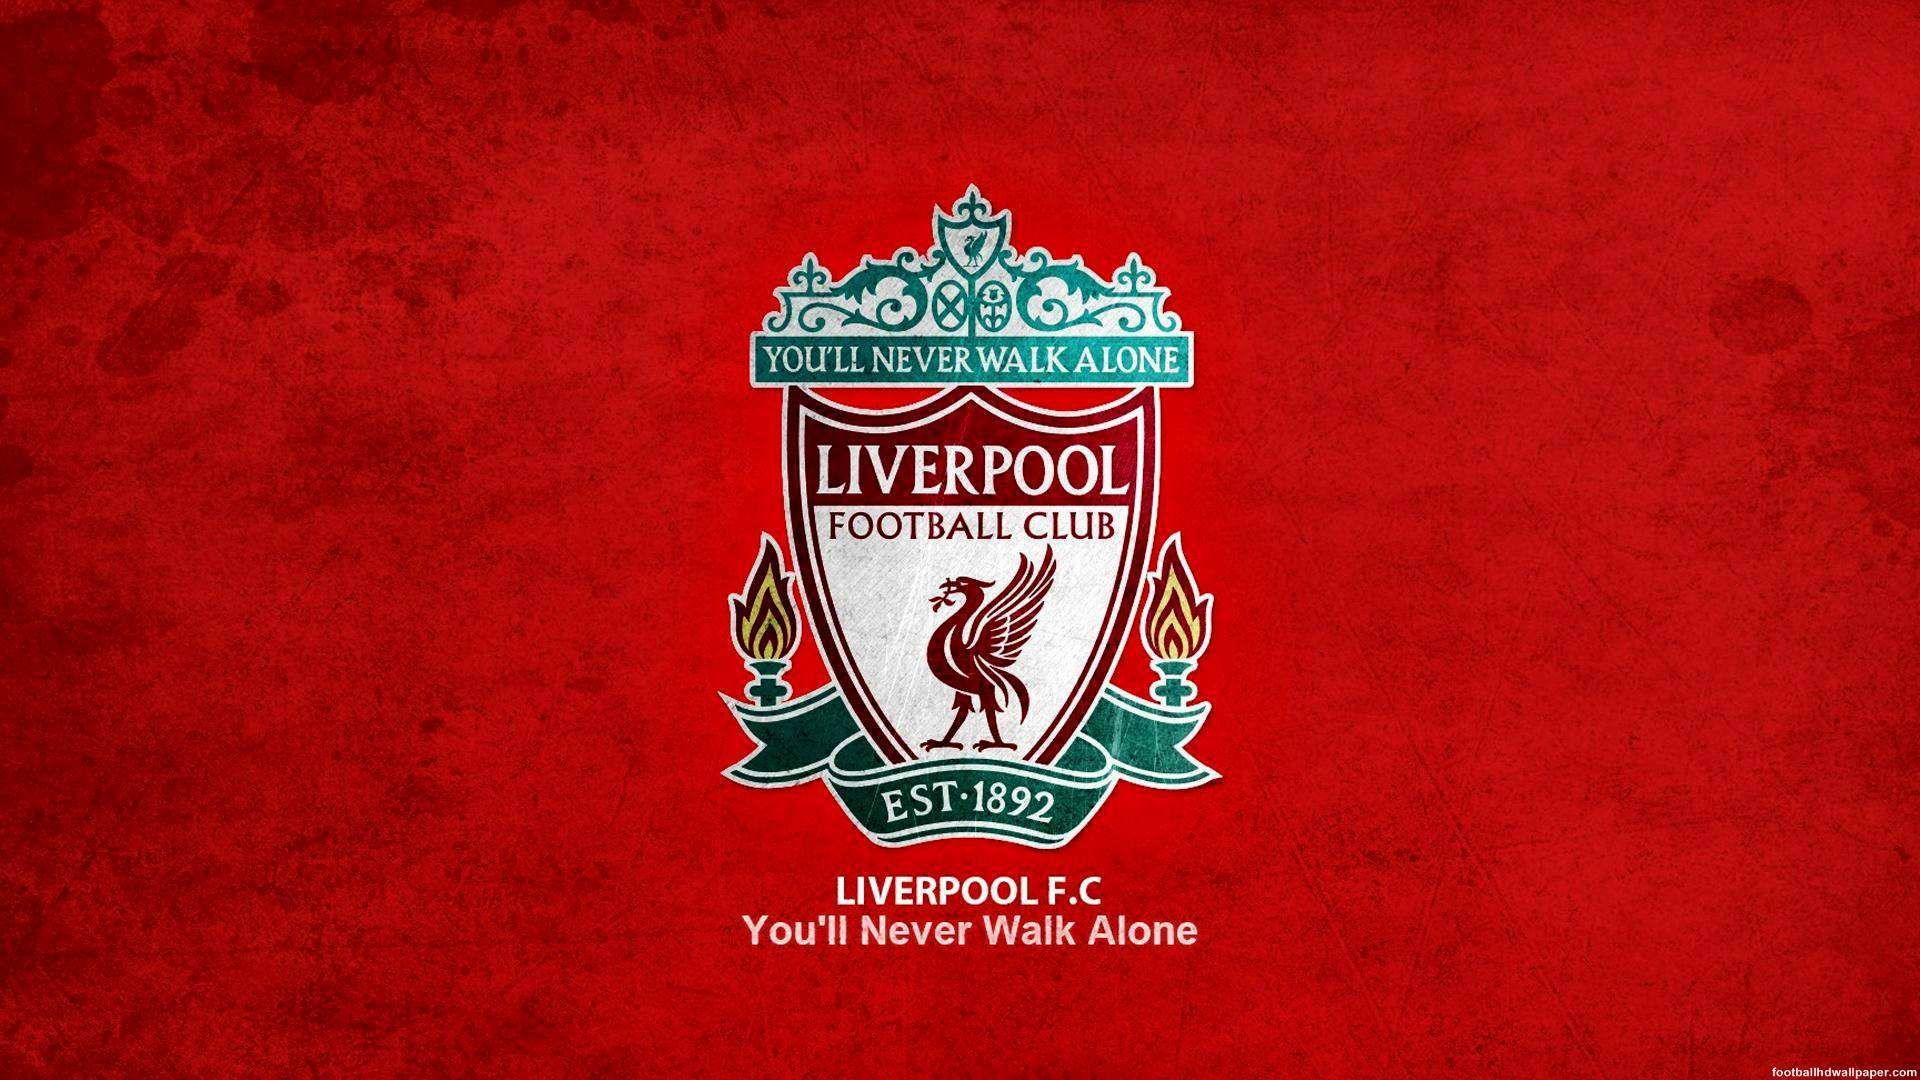 Kemenangan Liverpool, Menggaris Bawahi Kepercayaan